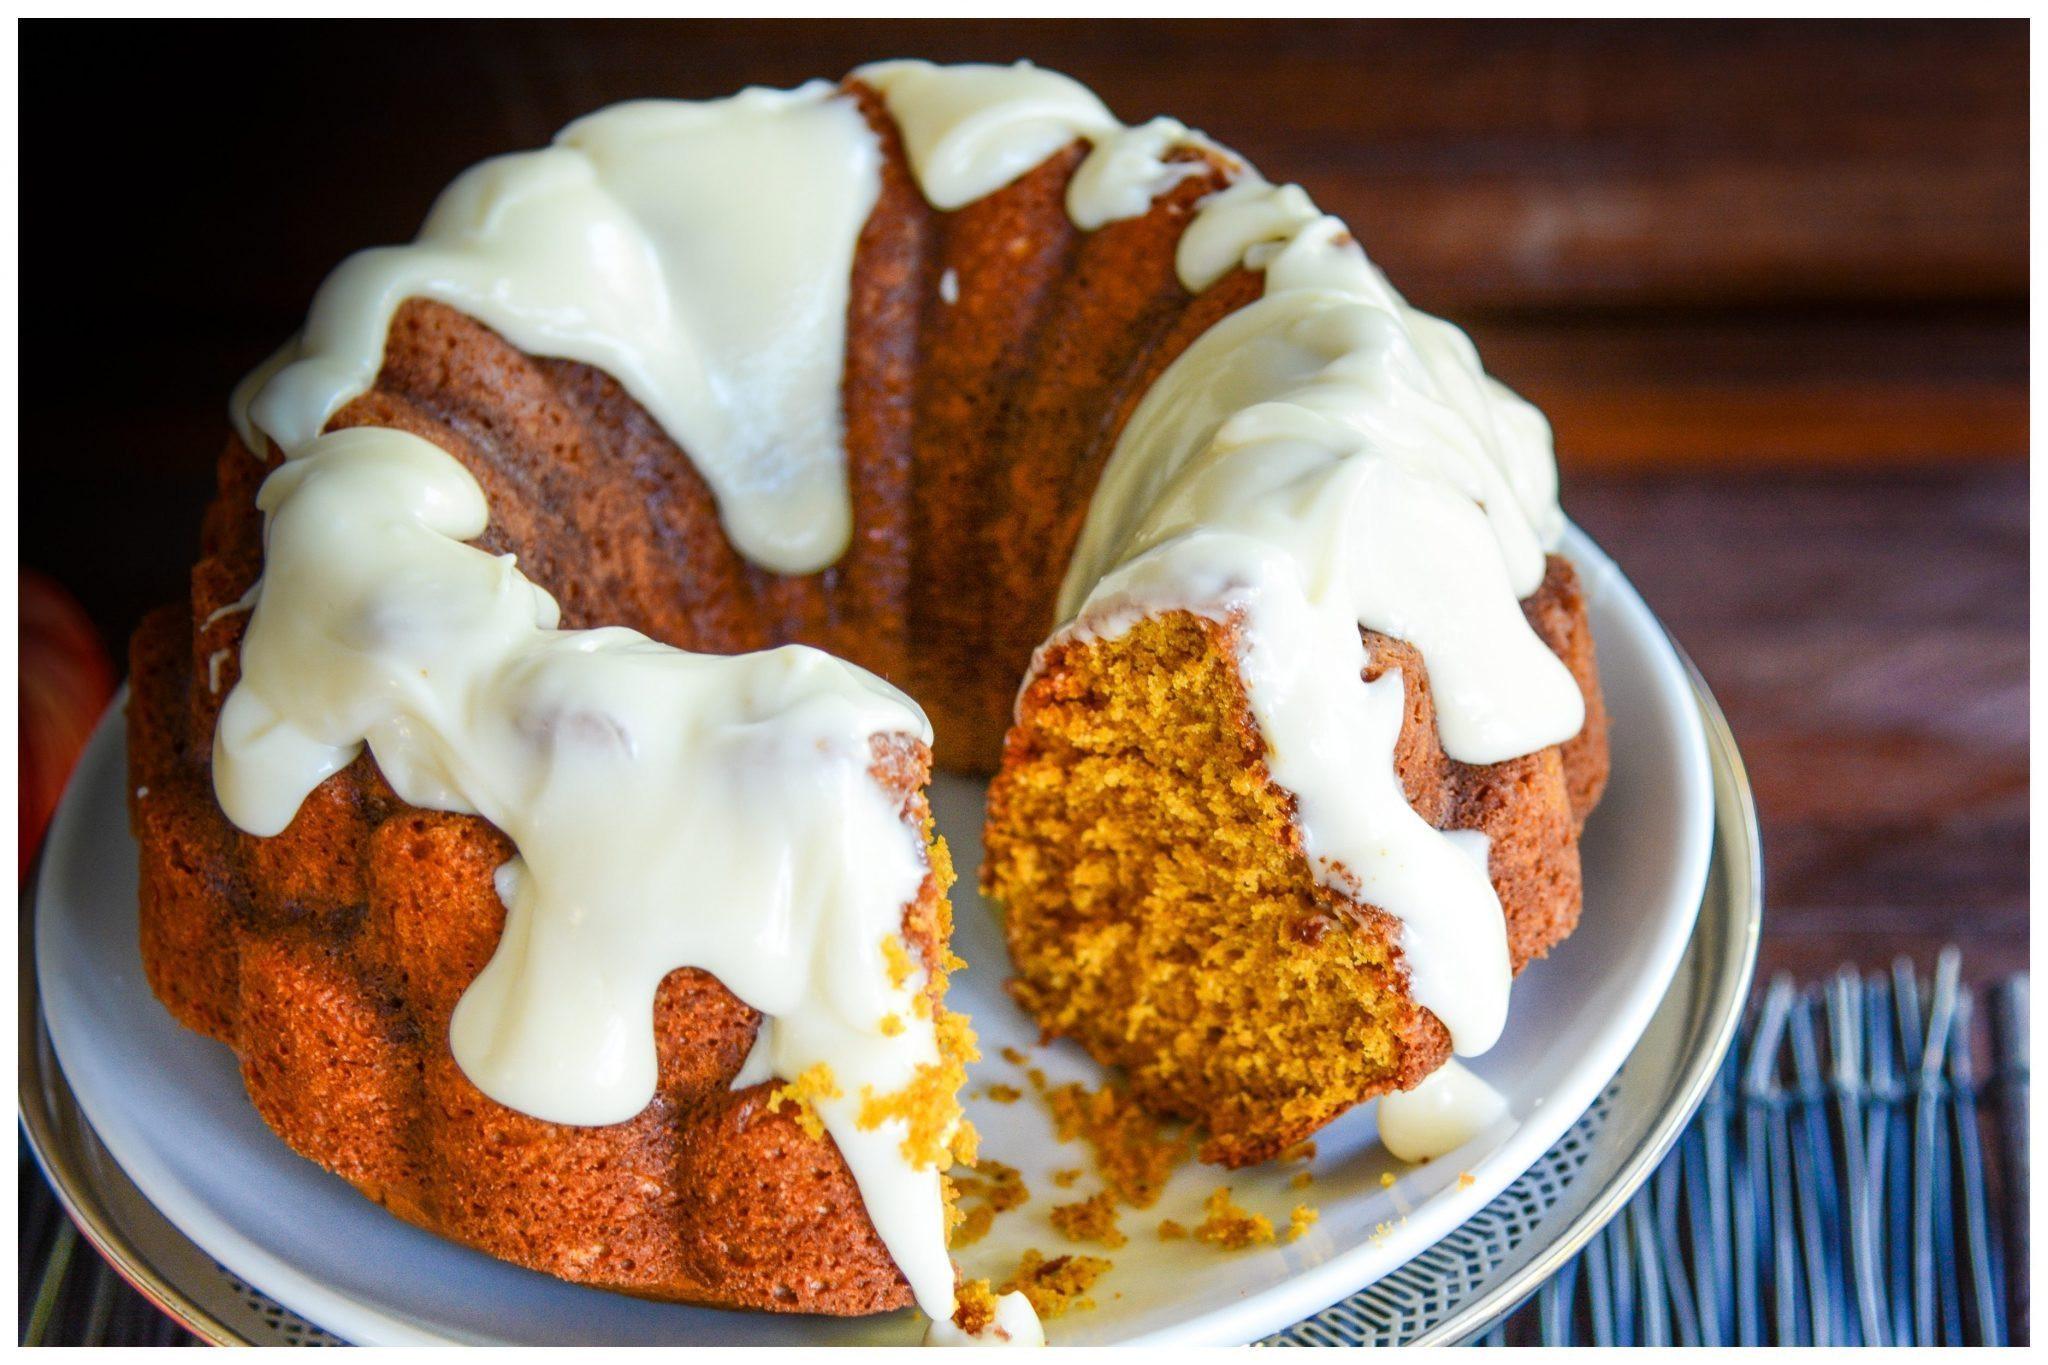 Healthy Bundt Cake Recipes  Pumpkin Spice Bundt Cake A Healthy Life For Me